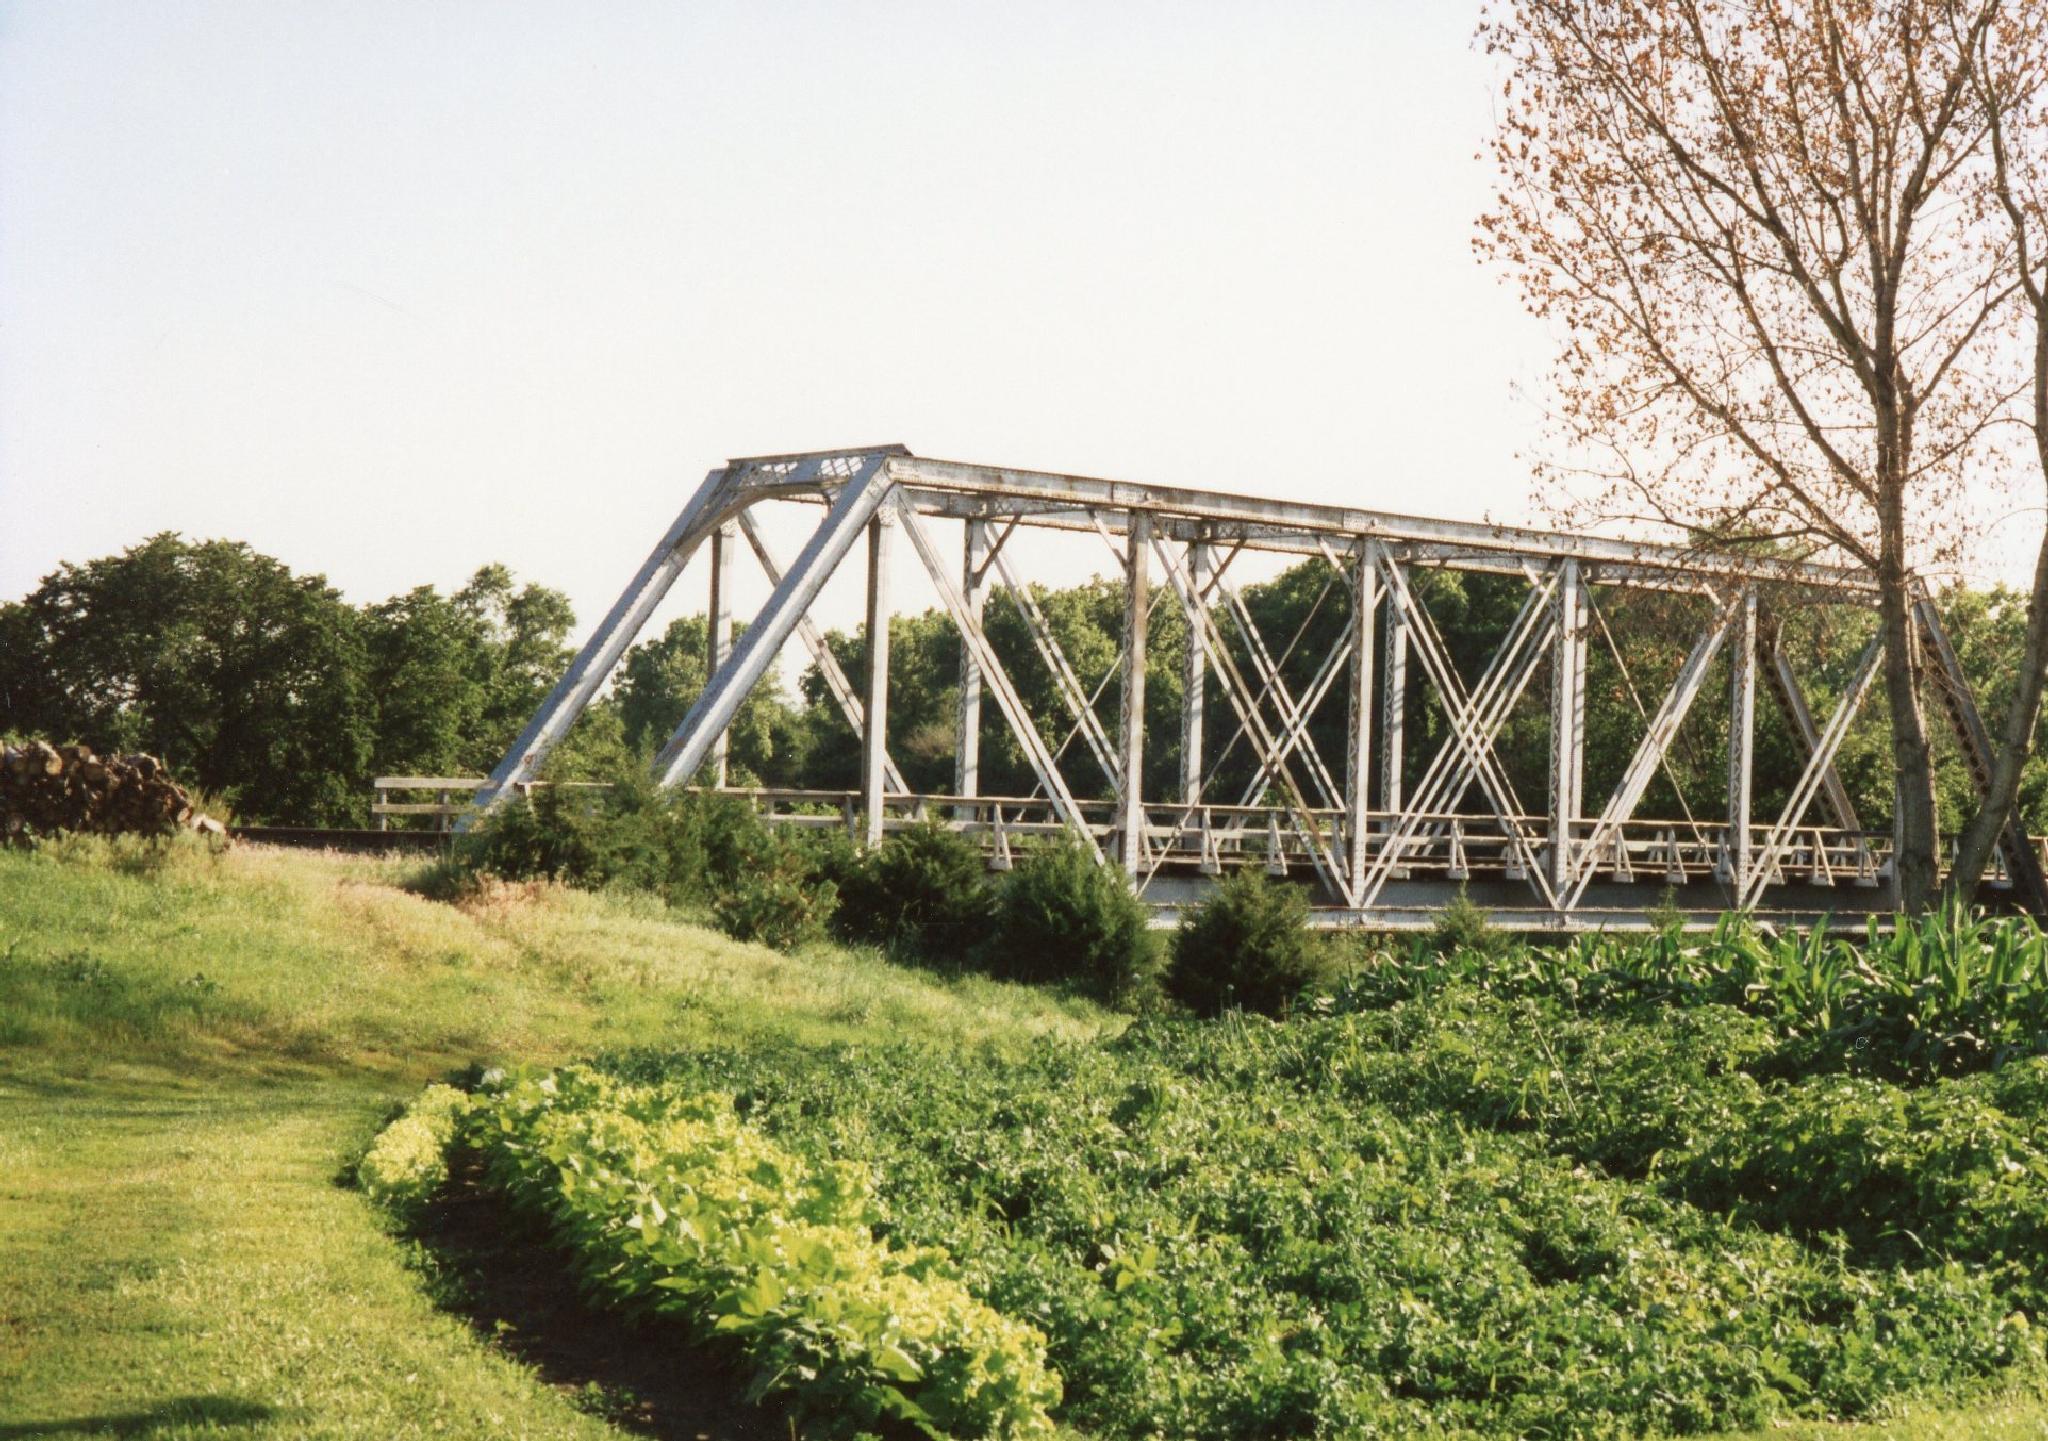 Railroad bridge by monarch